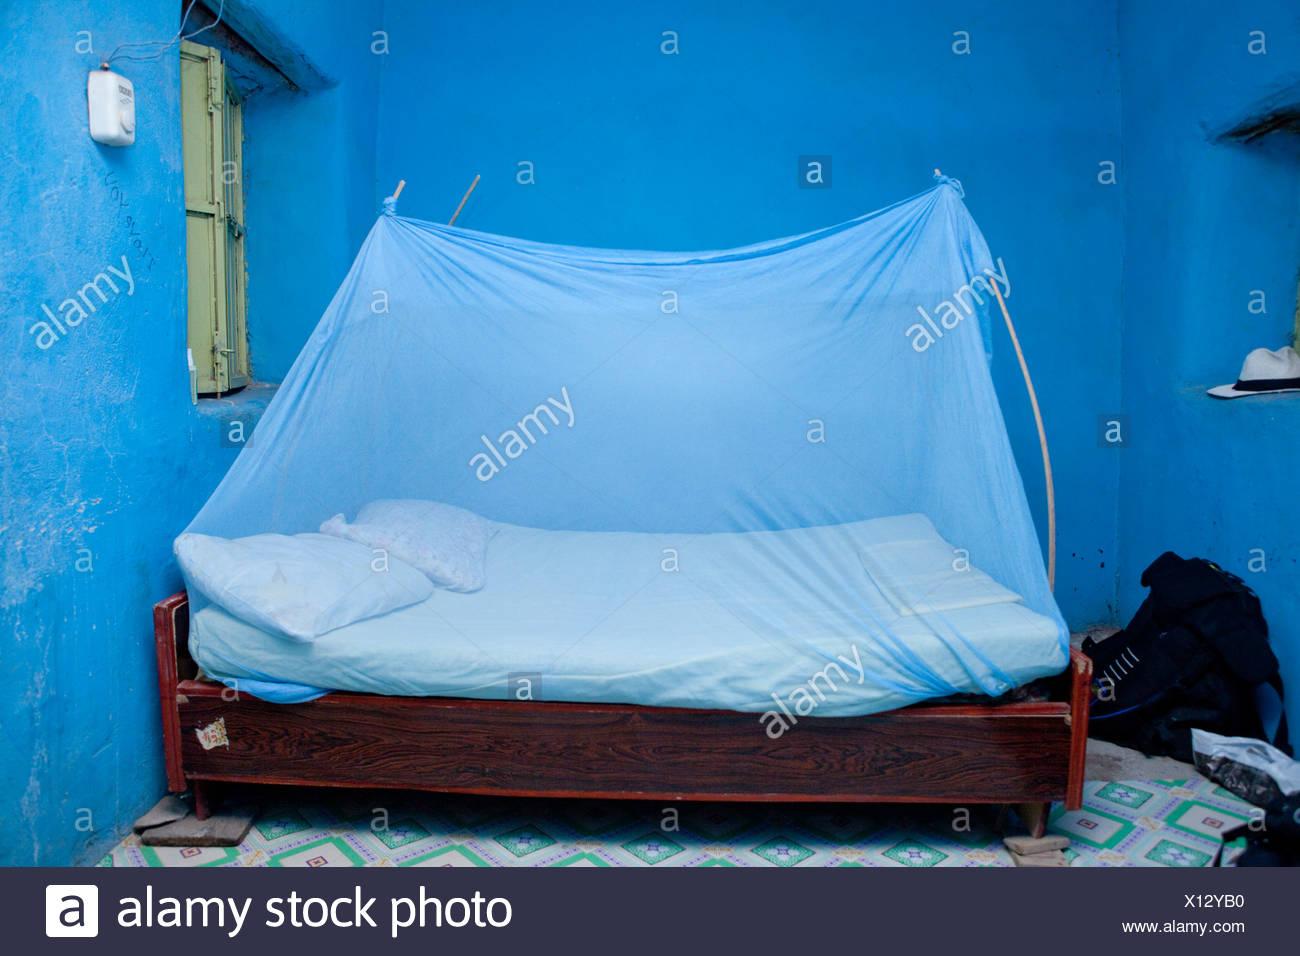 Hotel, Asaita, África, cama, mosquitera, mosquitero, primitivo, hotel, Etiopía, Imagen De Stock